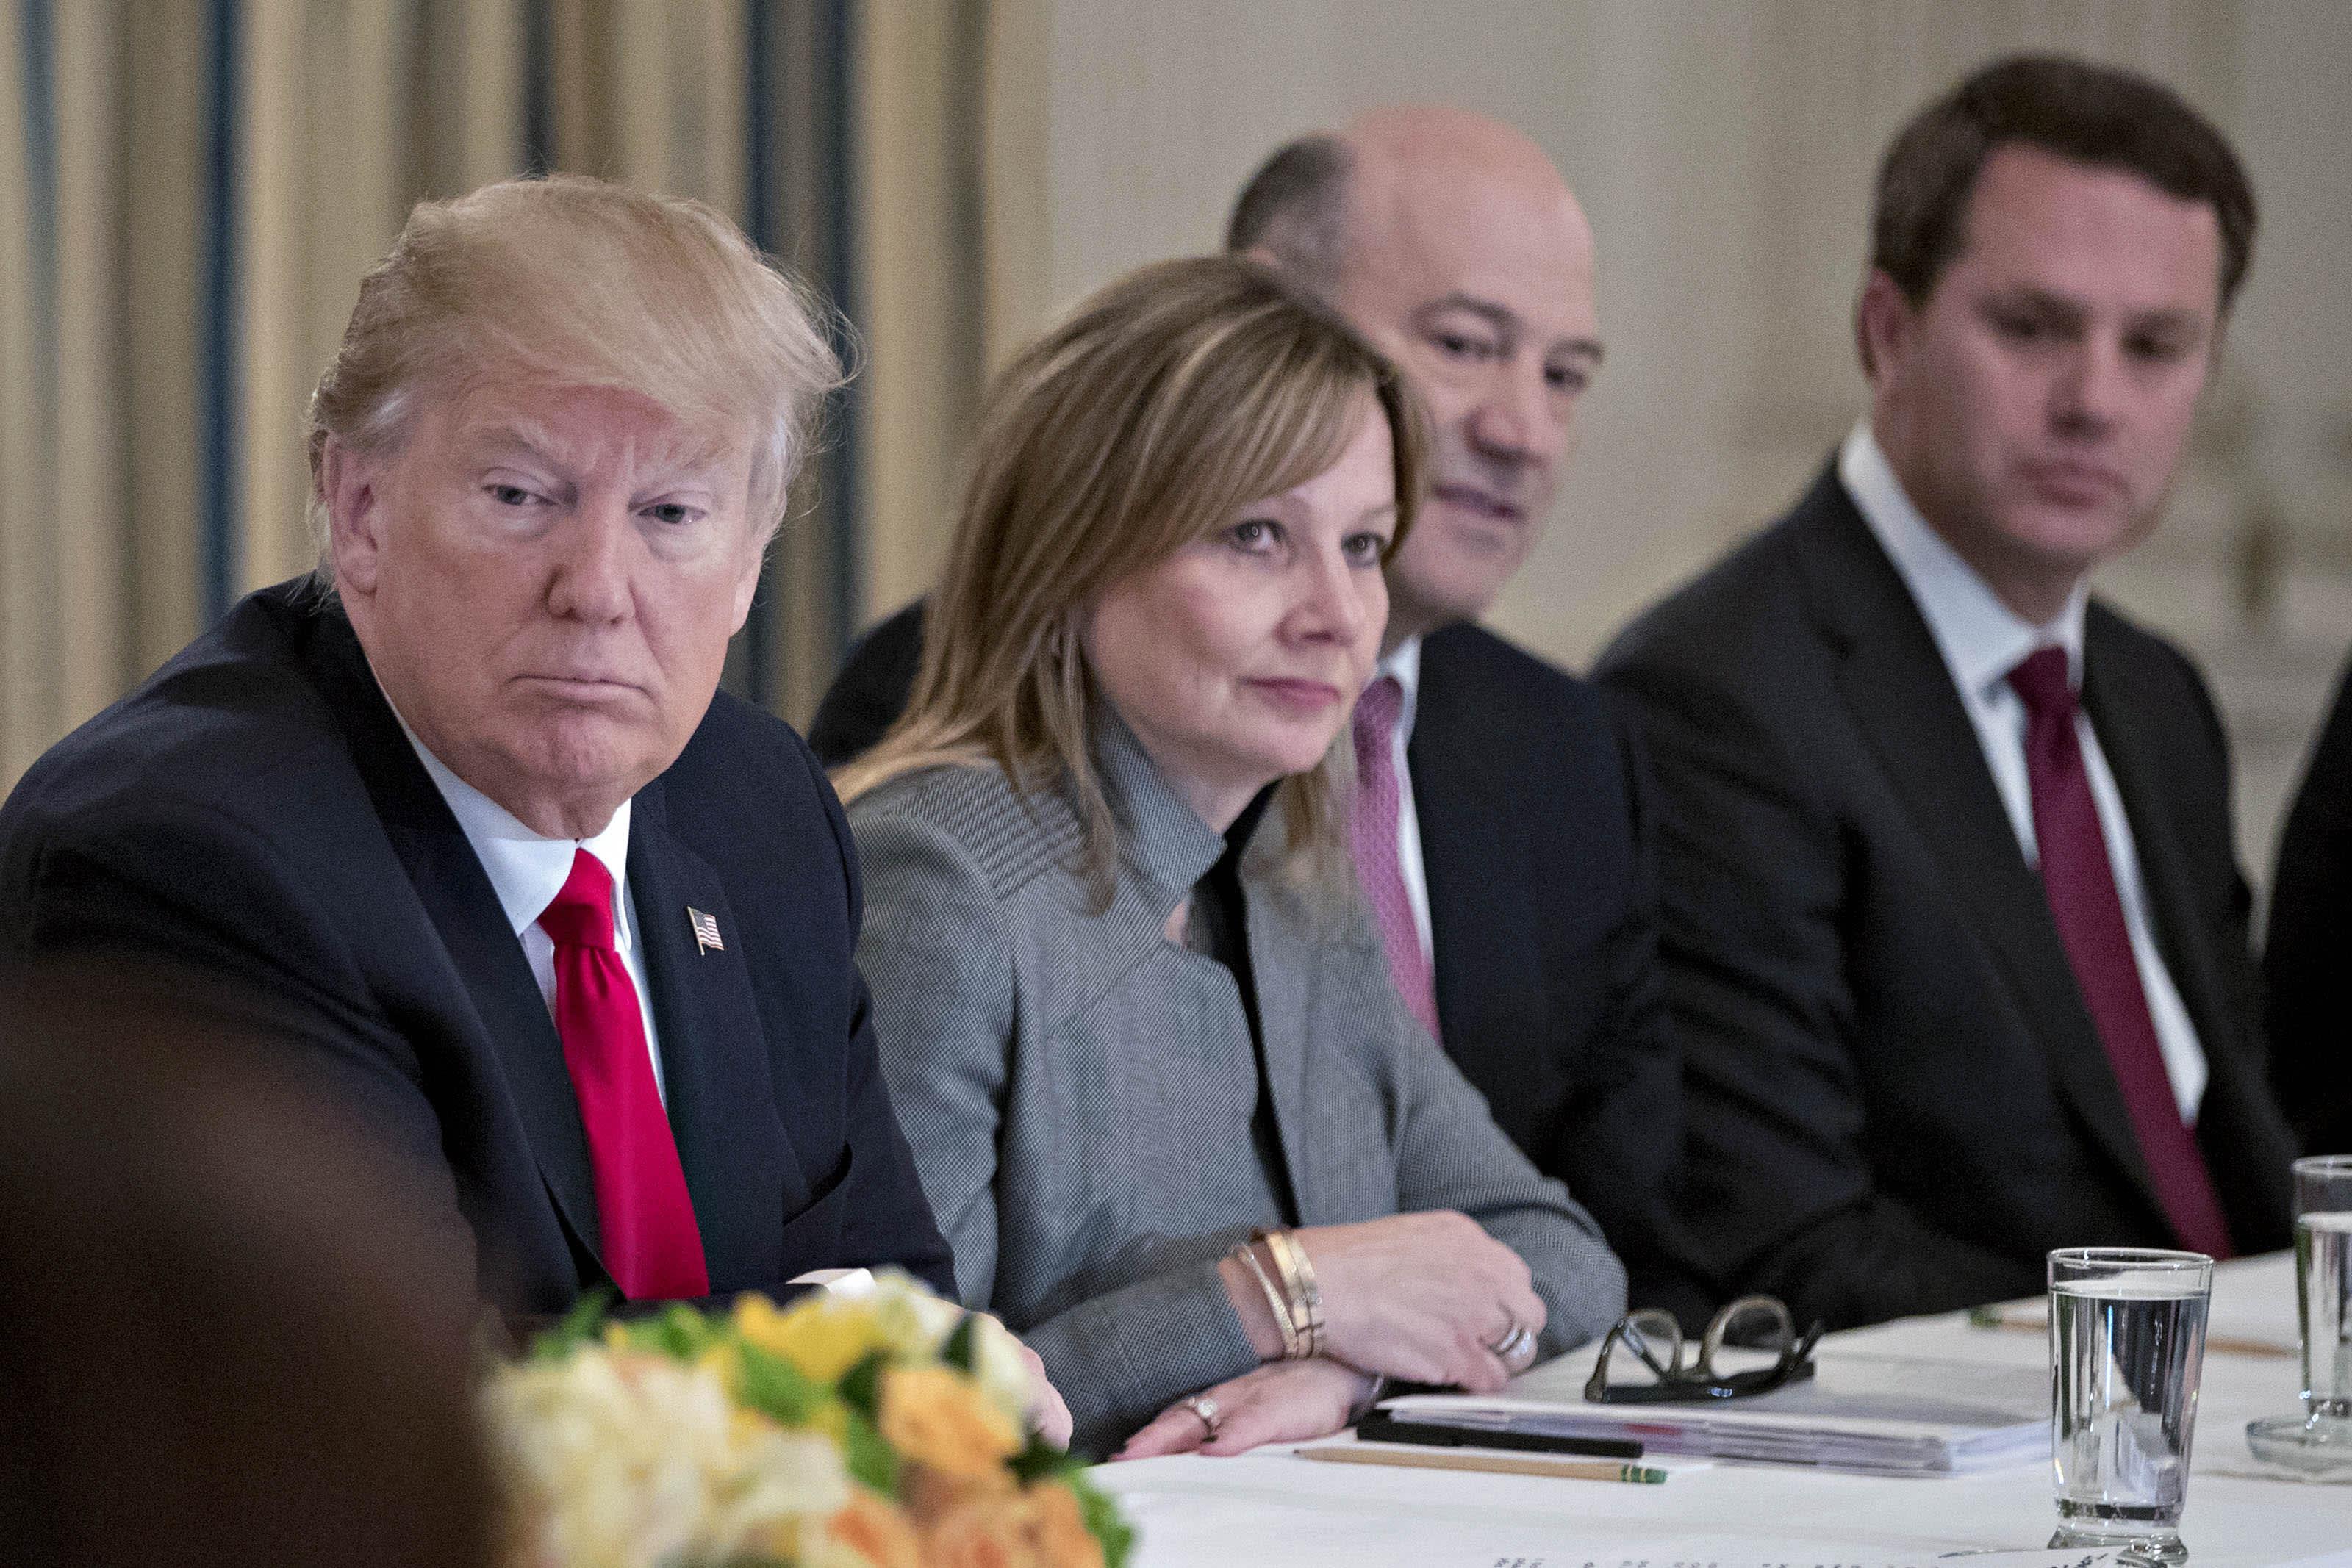 Trump attacks General Motors over China, US employment